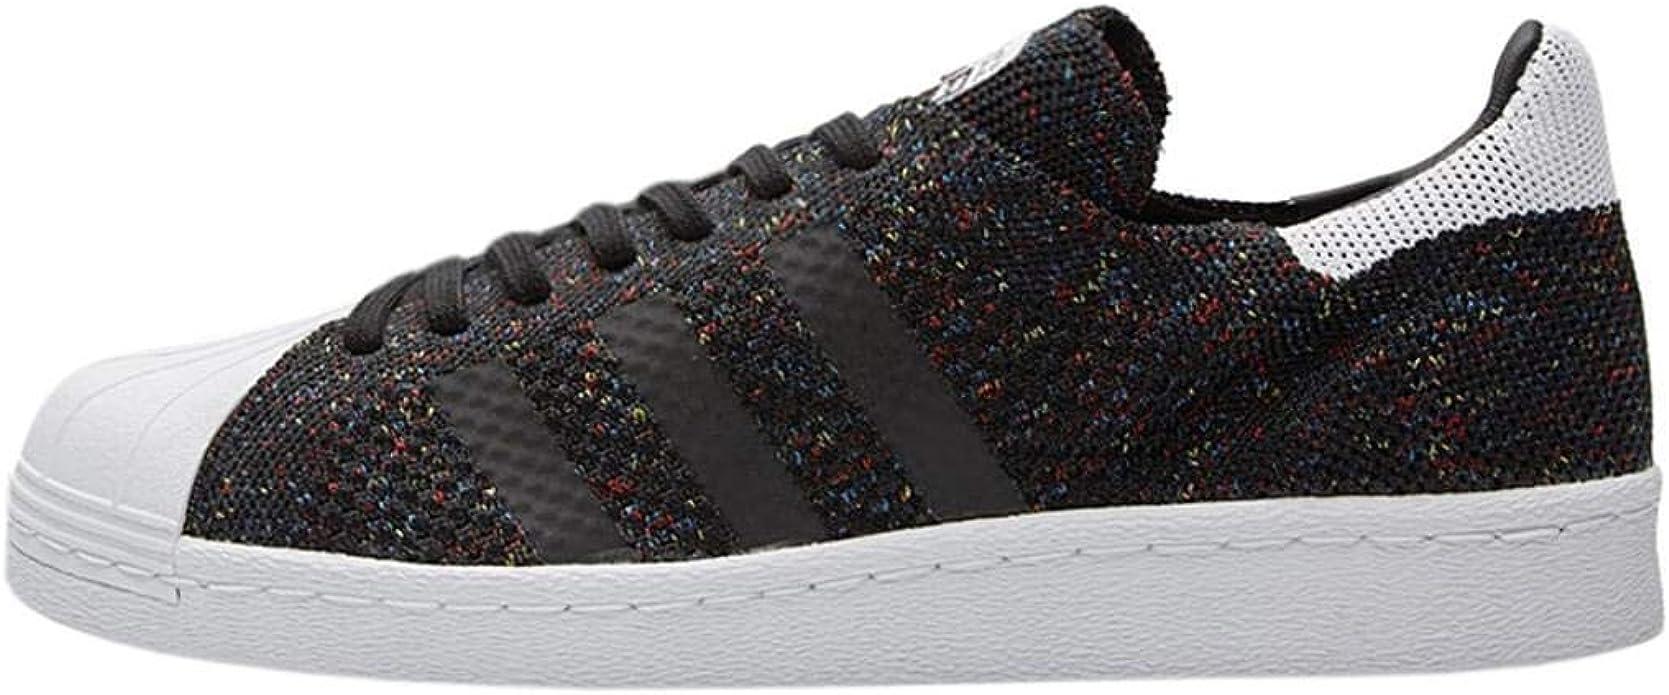 Escepticismo enemigo felicidad  adidas Superstar 80's Primeknit Men's Sneaker Black, Core Black/FTWR White,  Size 49 1/3 UK 13: Amazon.co.uk: Shoes & Bags